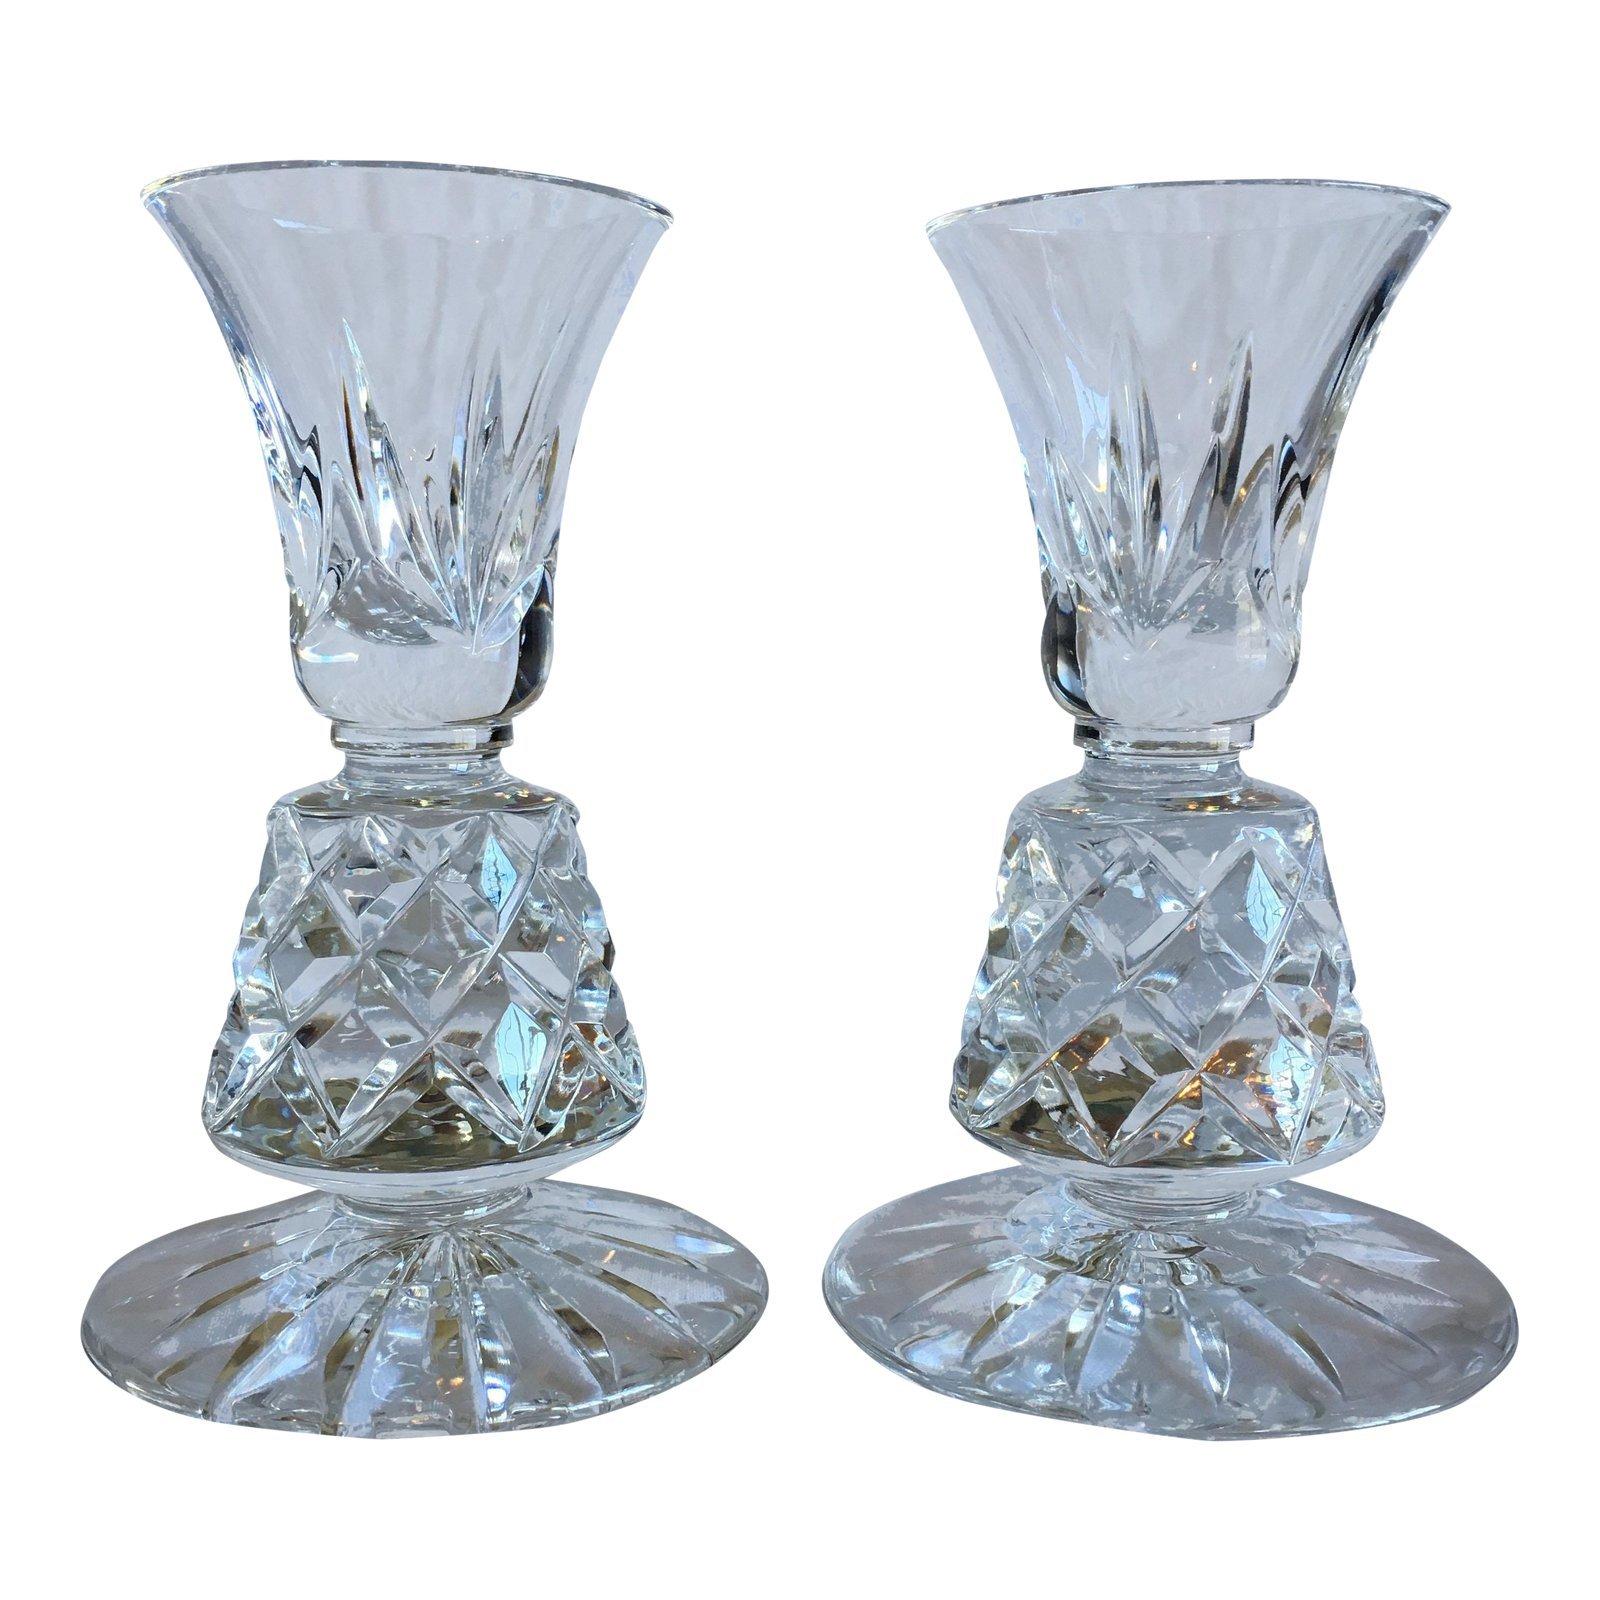 Vintage crystal candle holders lenox charleston pattern a pair 4910 1